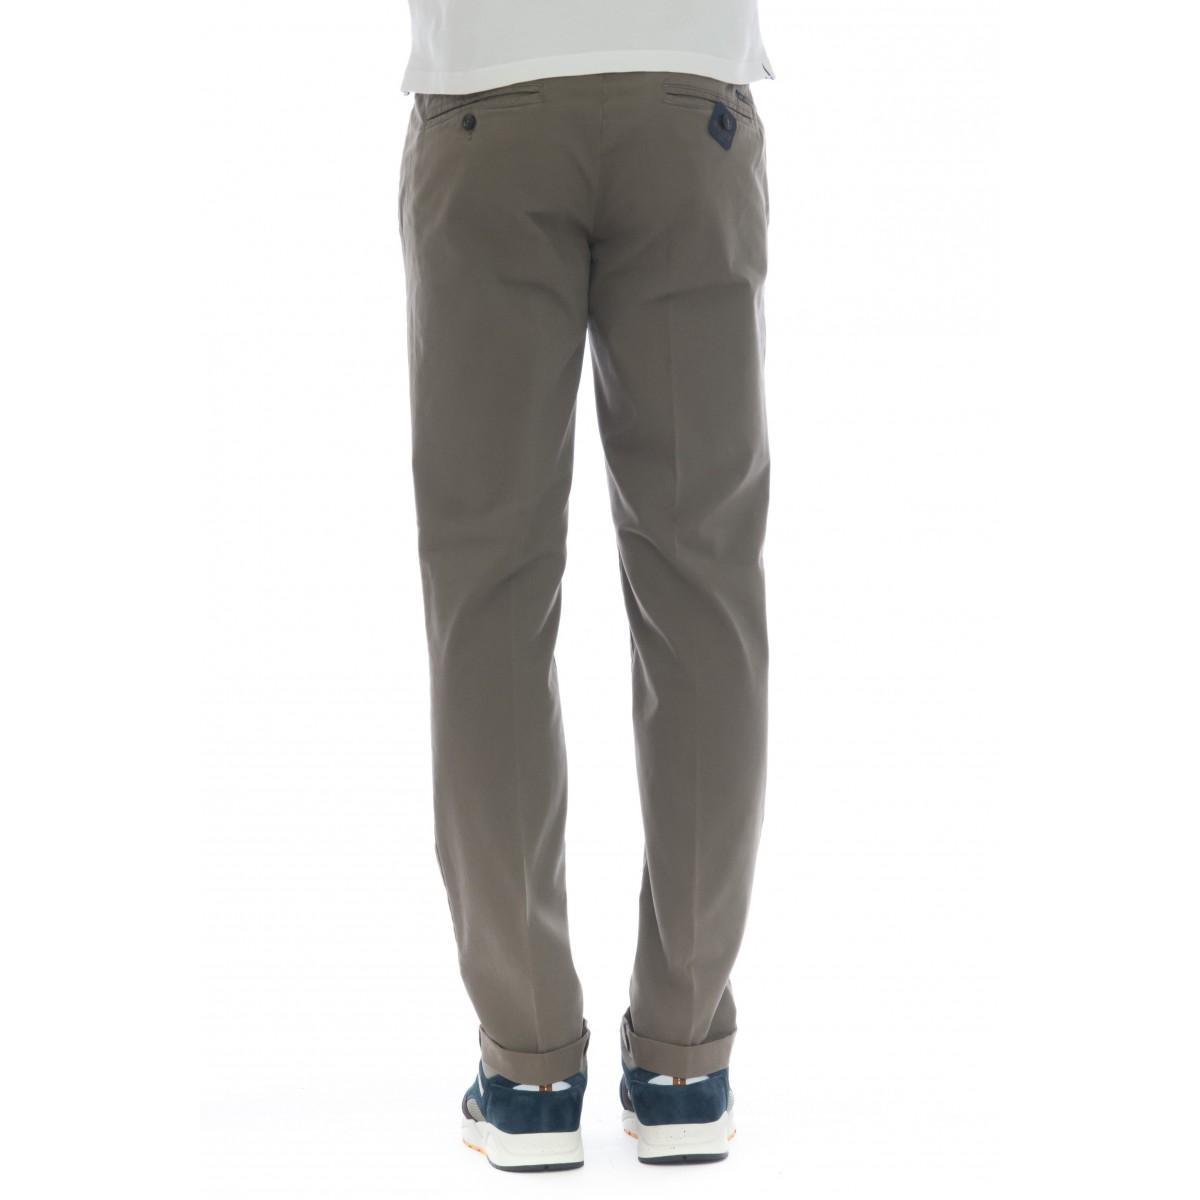 Pantalone uomo - Lenny 5578 slim tinta unita